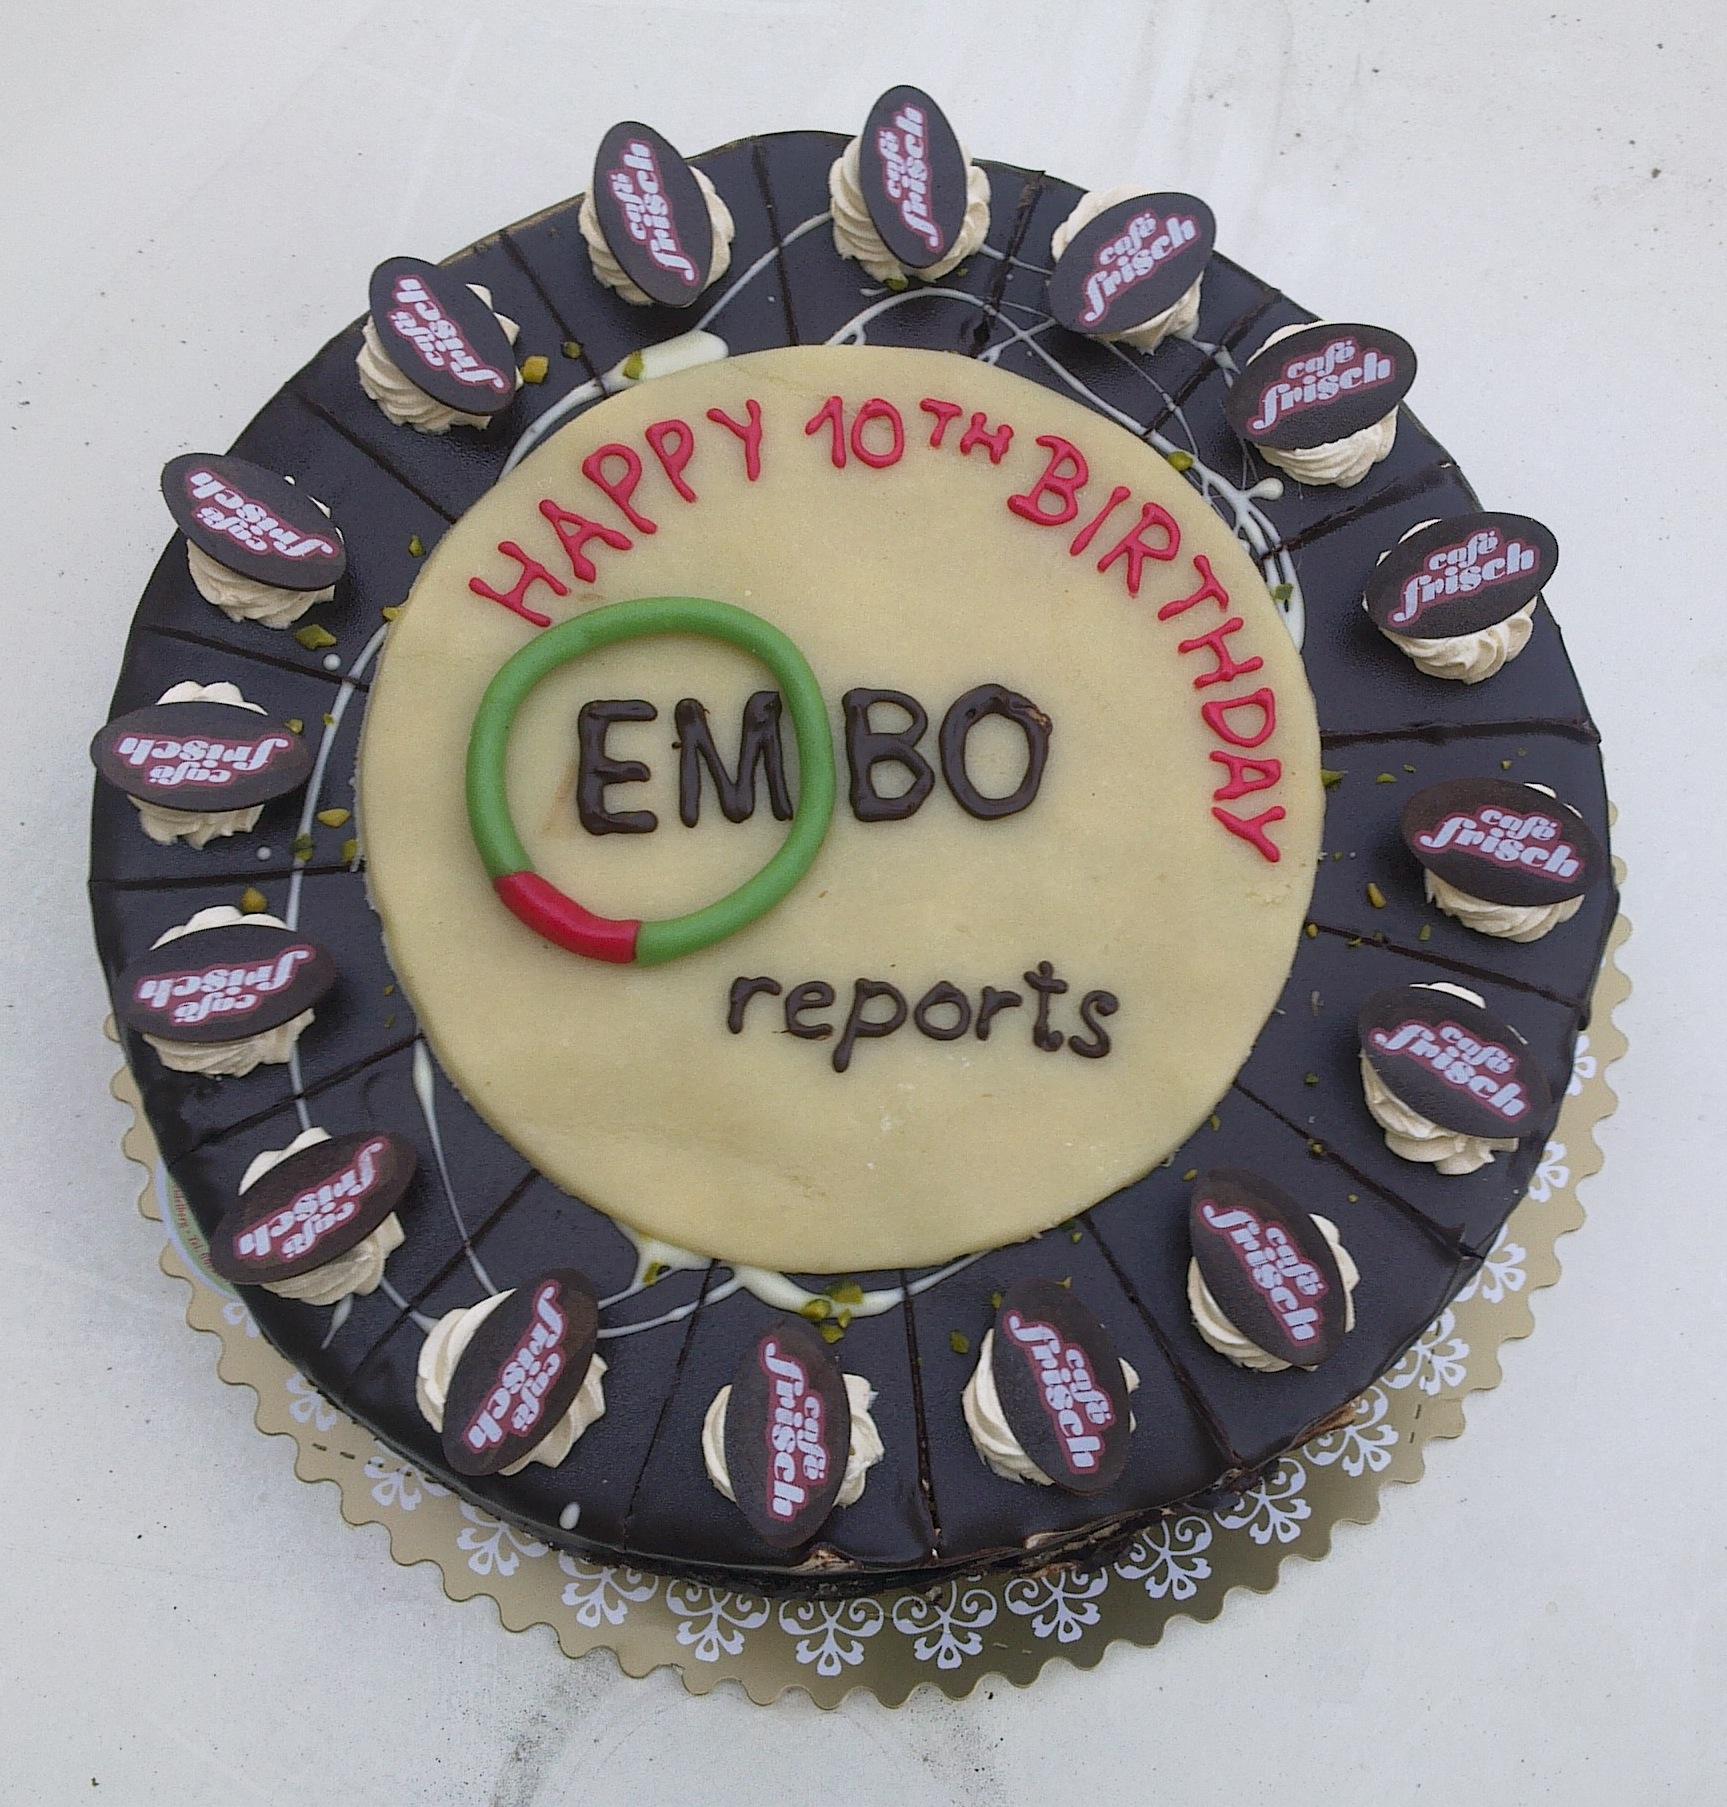 FileEMBO Reports 10th Birthday Cake